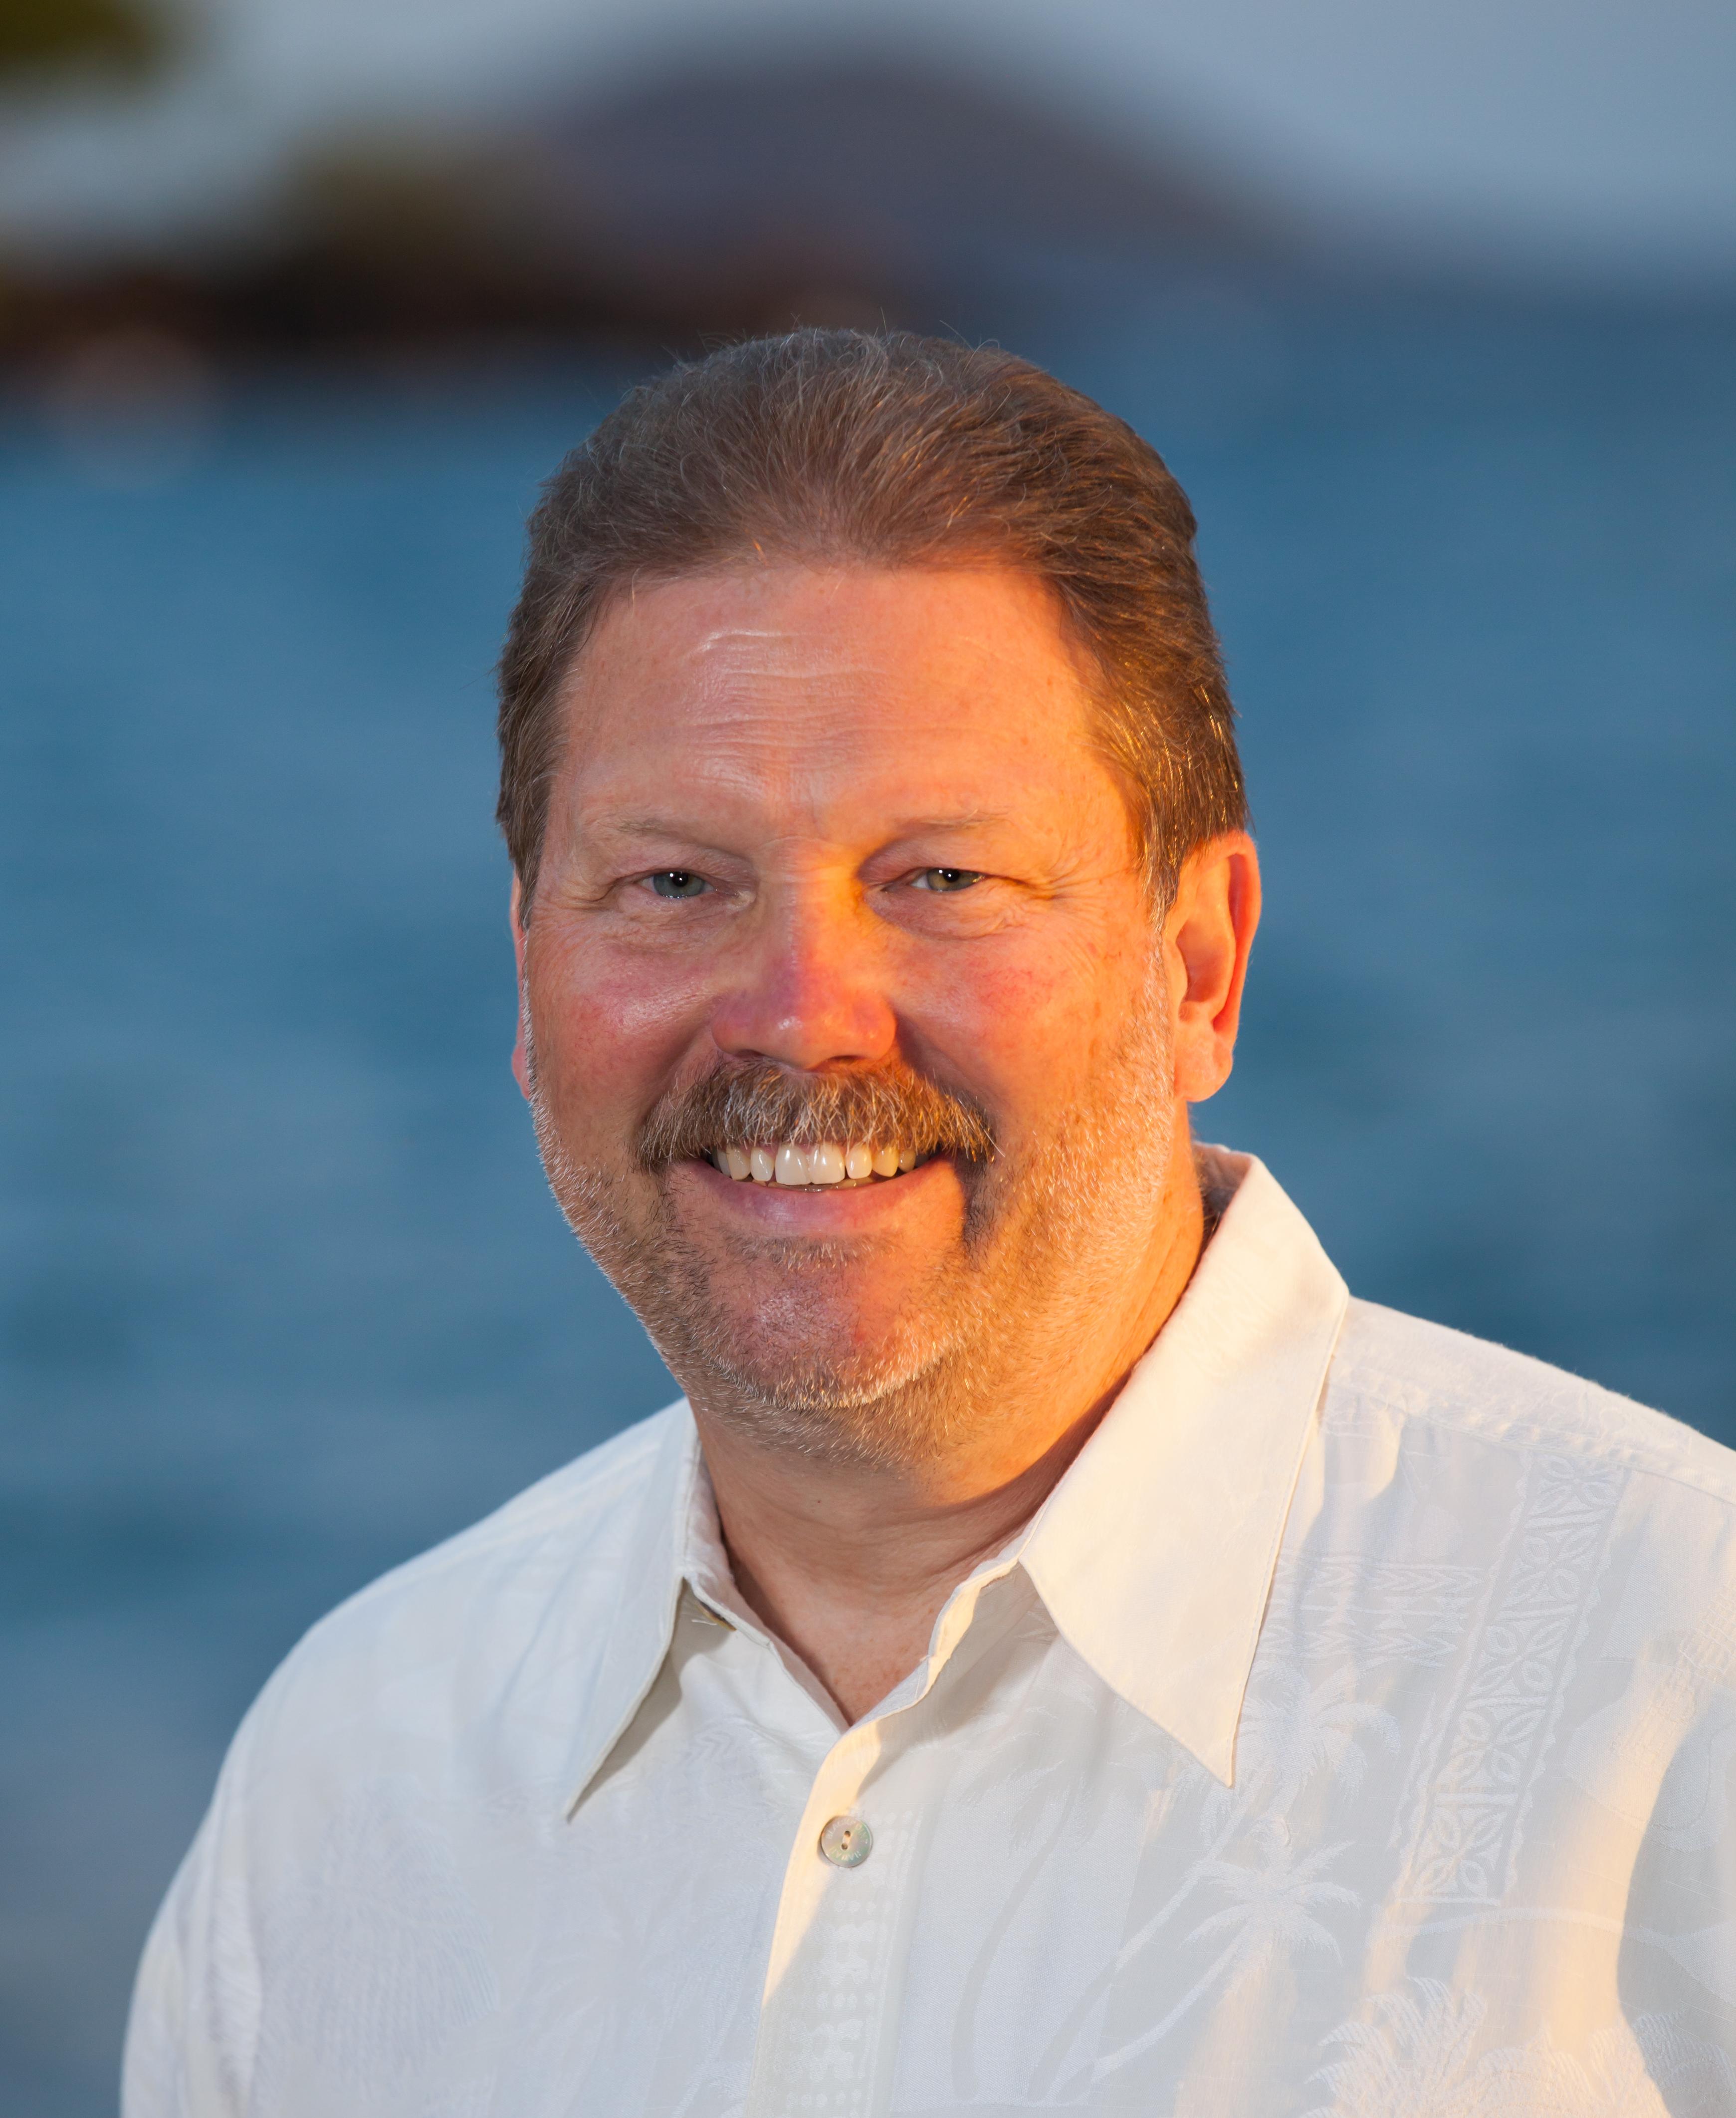 Roger Pleski